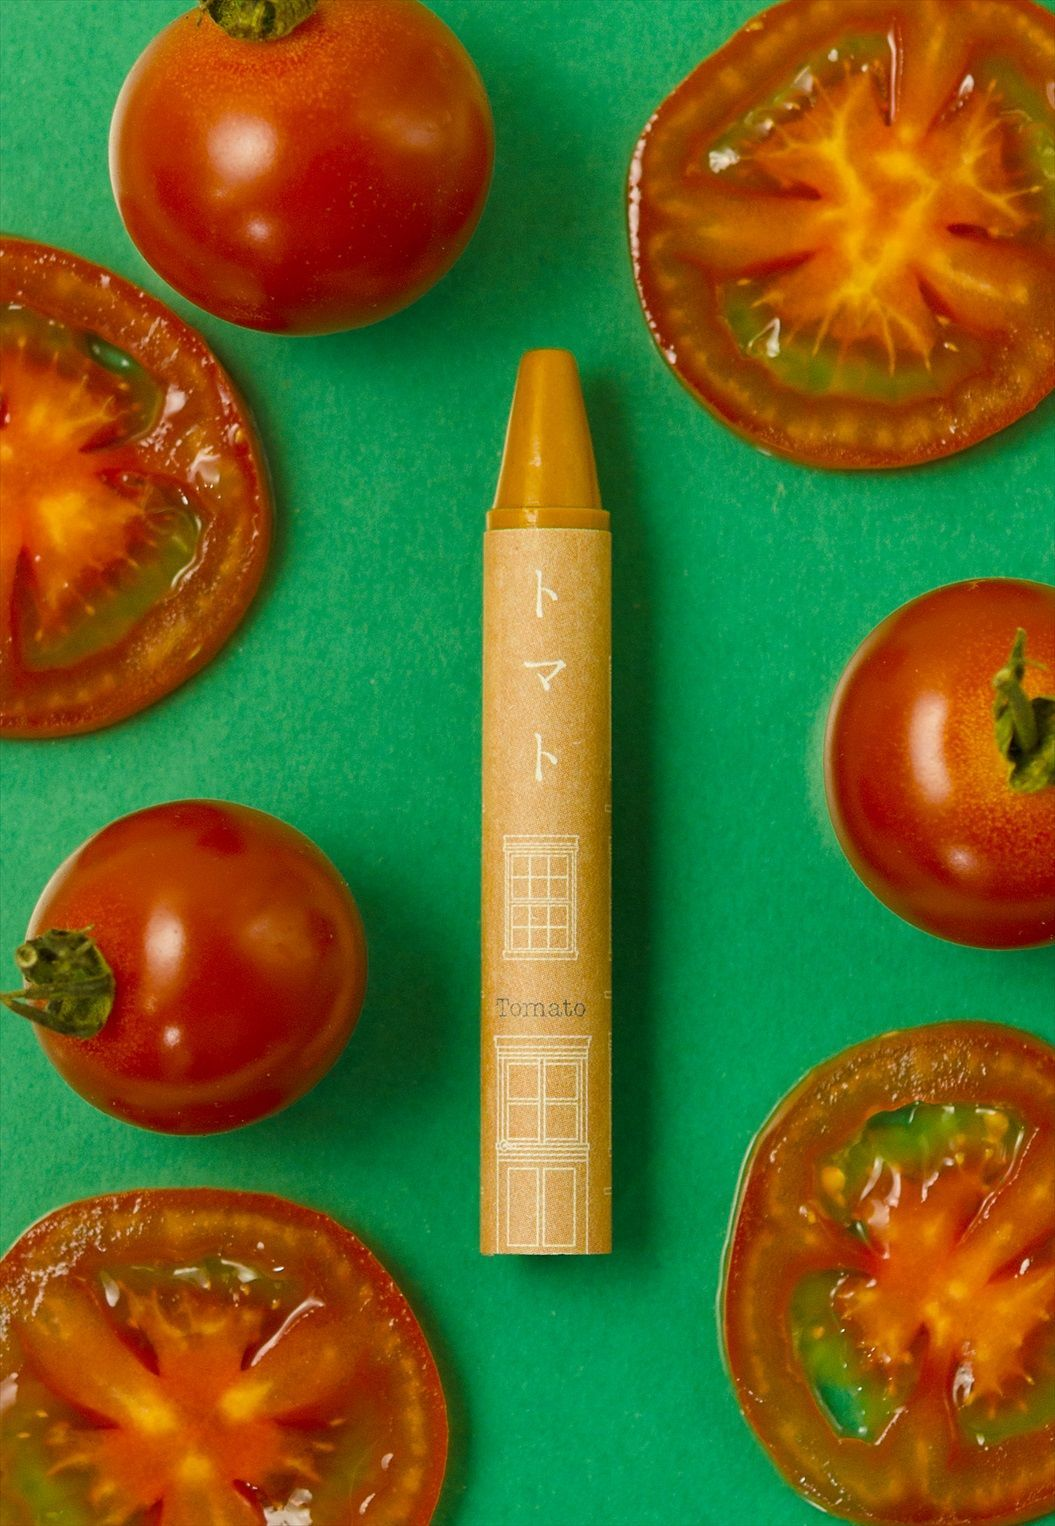 06_trim_tomato_R